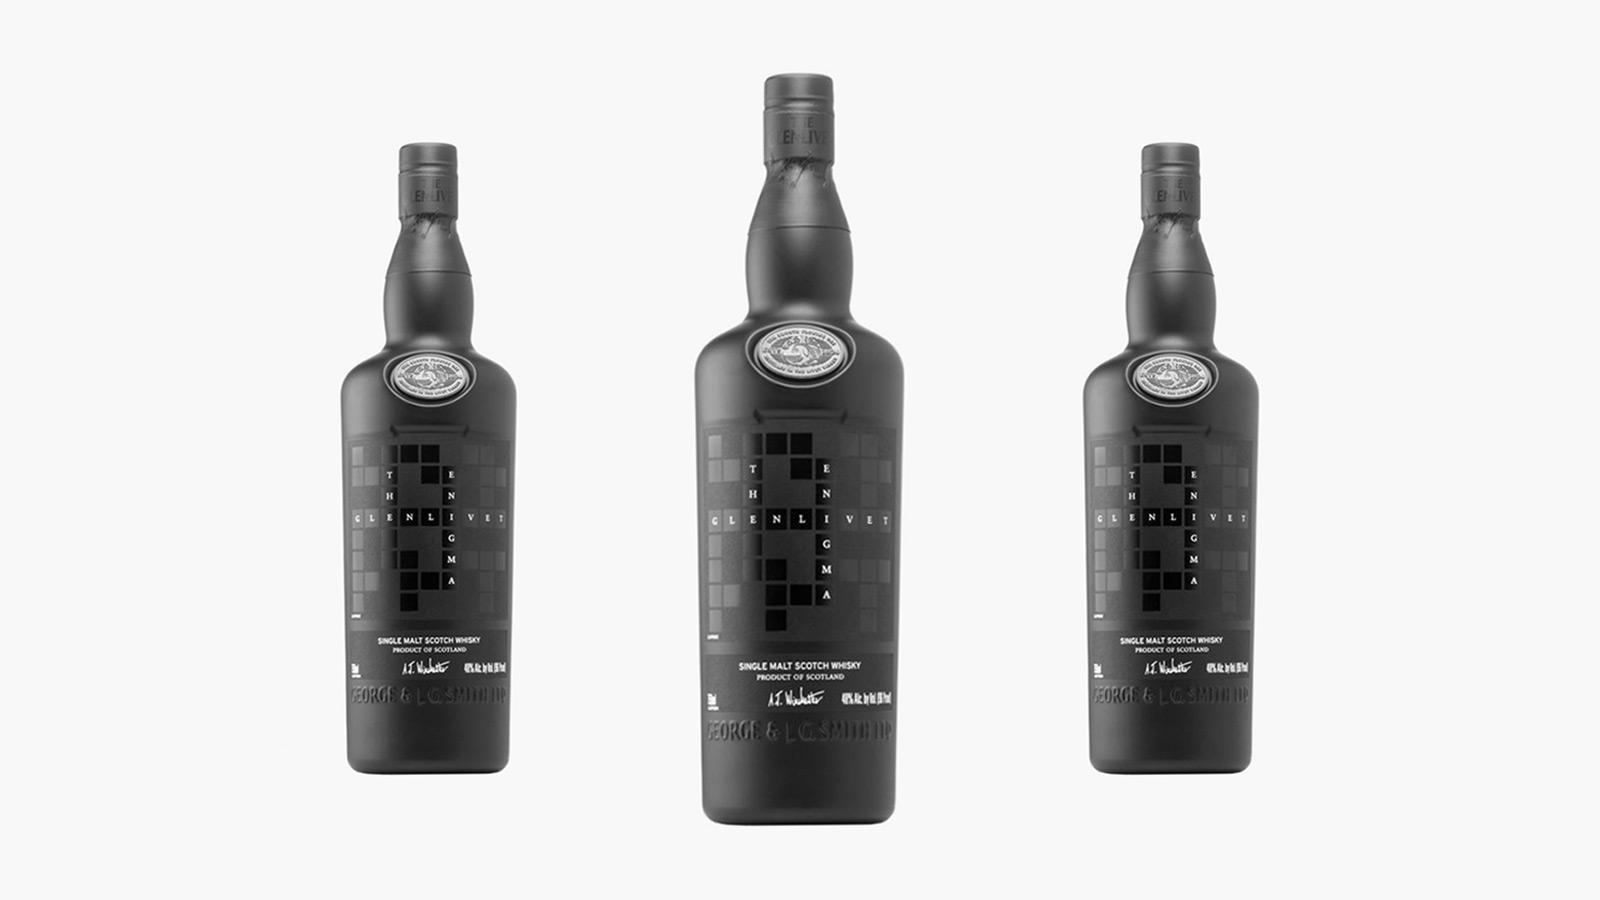 Glenlivet Enigma Scotch Single Malt Whisky